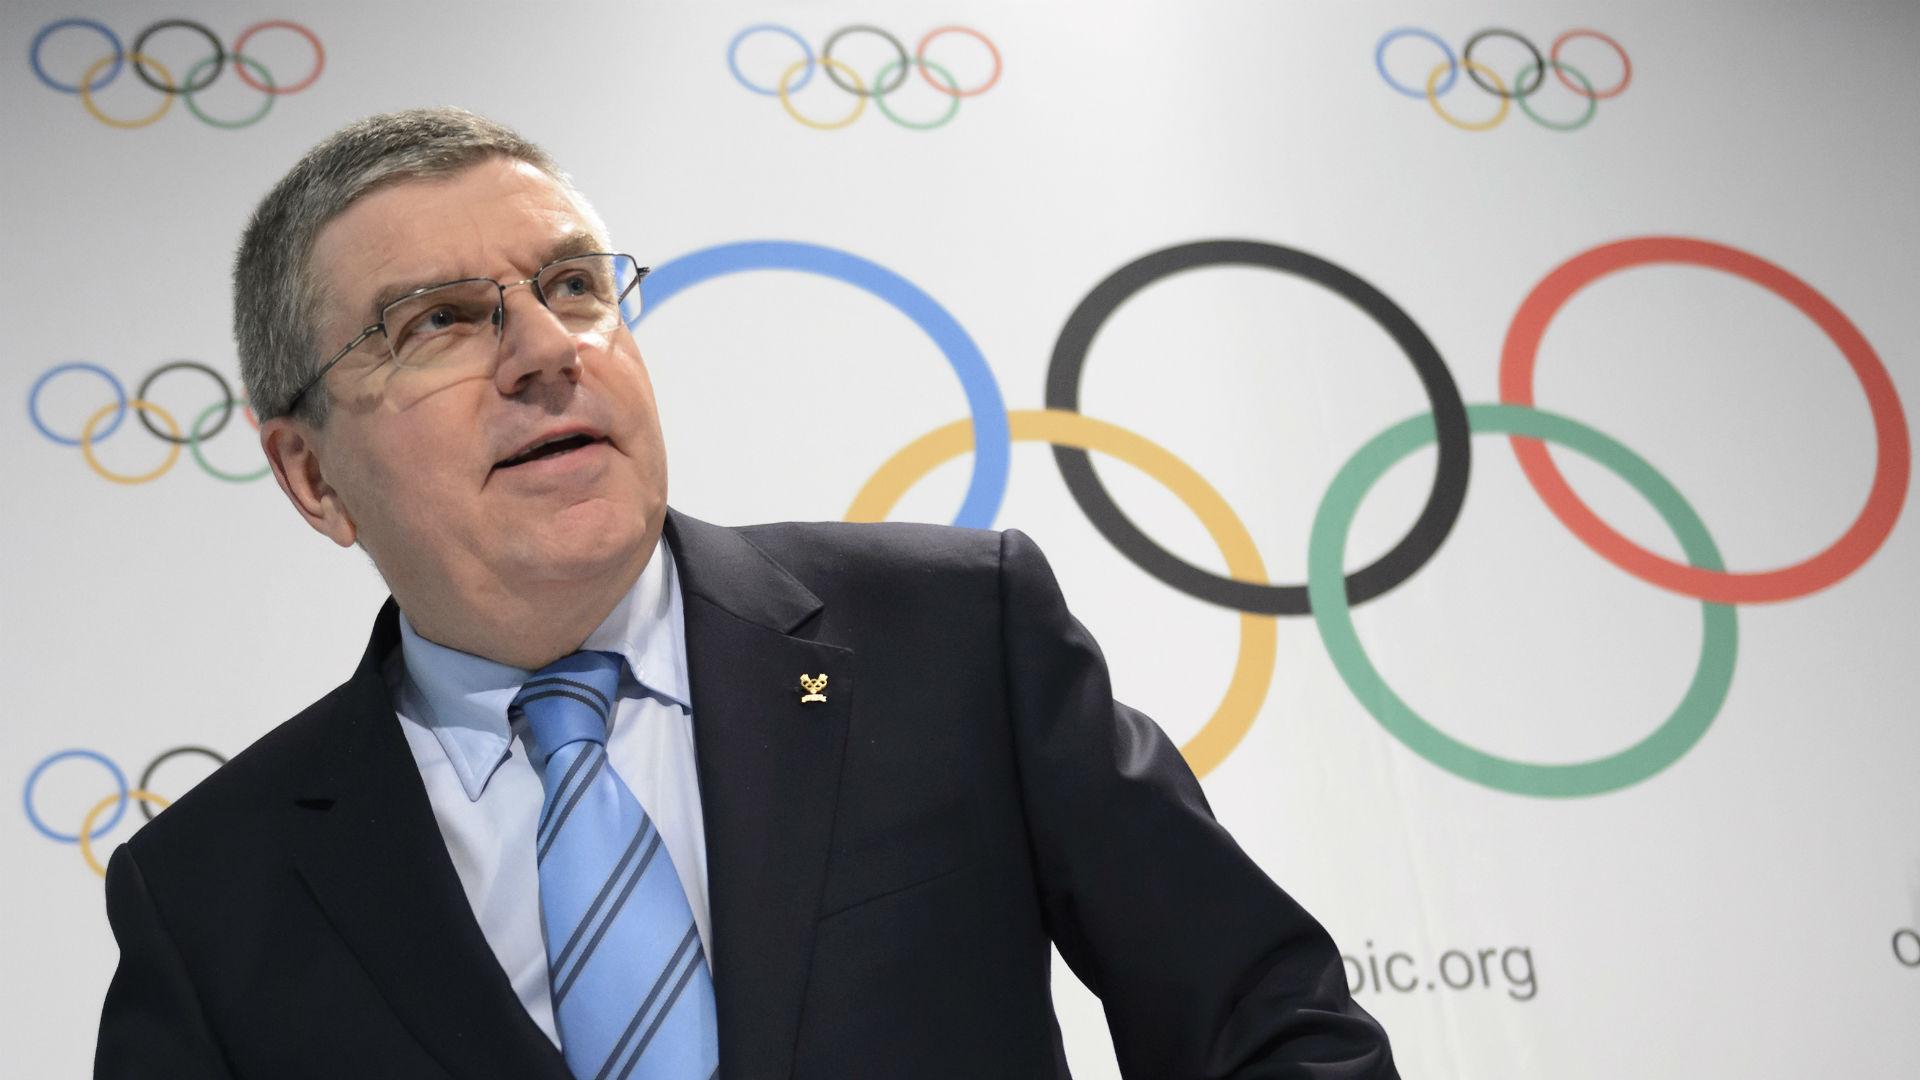 واکنش شما به حرف رئیس کمیته بینالمللی المپیک چیه؟